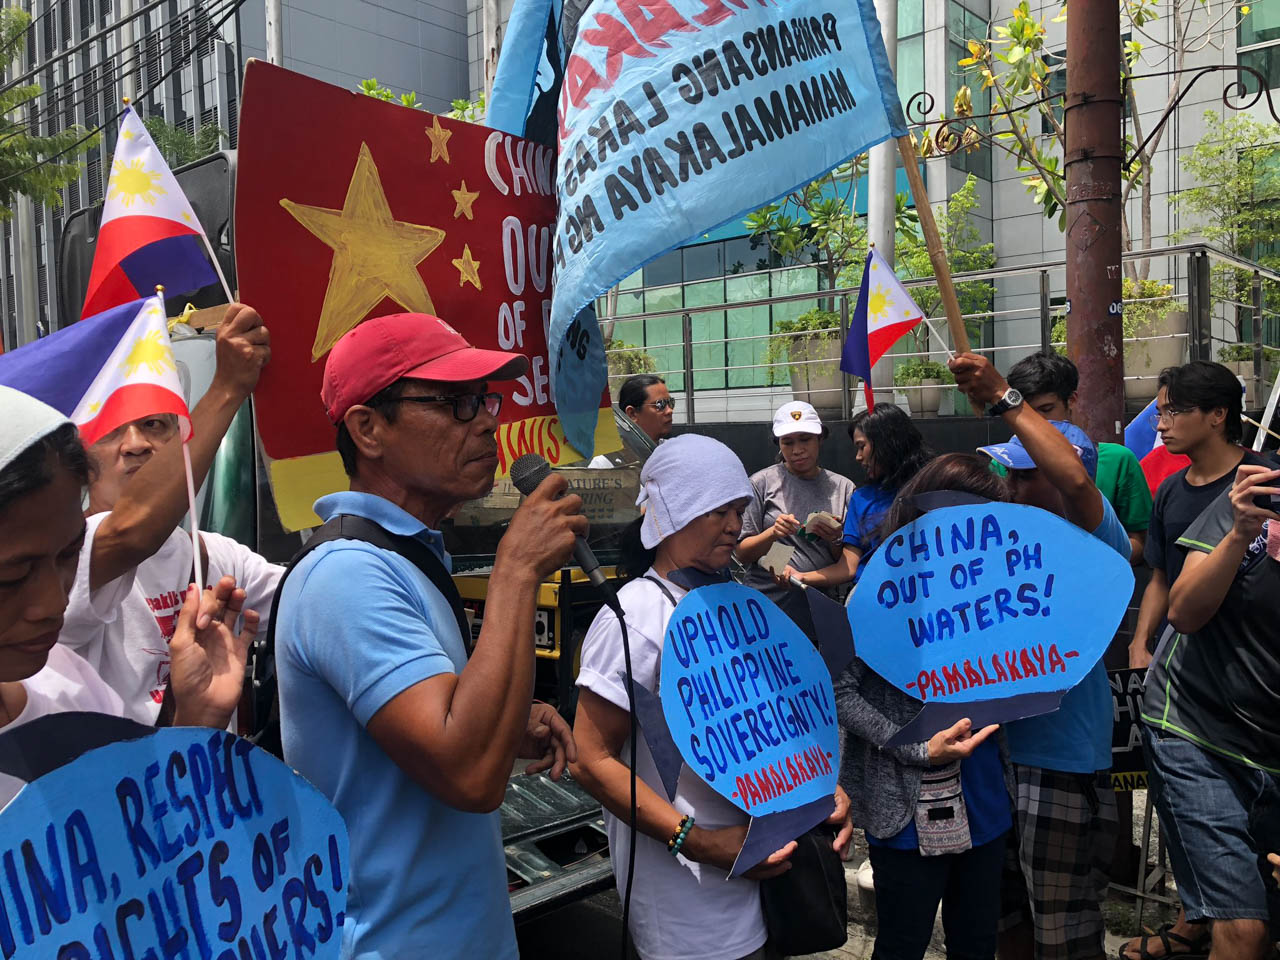 MAKATI. Bobby Roldan, Pamalakaya Central Luzon, discusses the struggles of Filipino fisherfolk in a rally held in Makati on Wednesday, June 12. Photo by Arlan Jondonero/Rappler